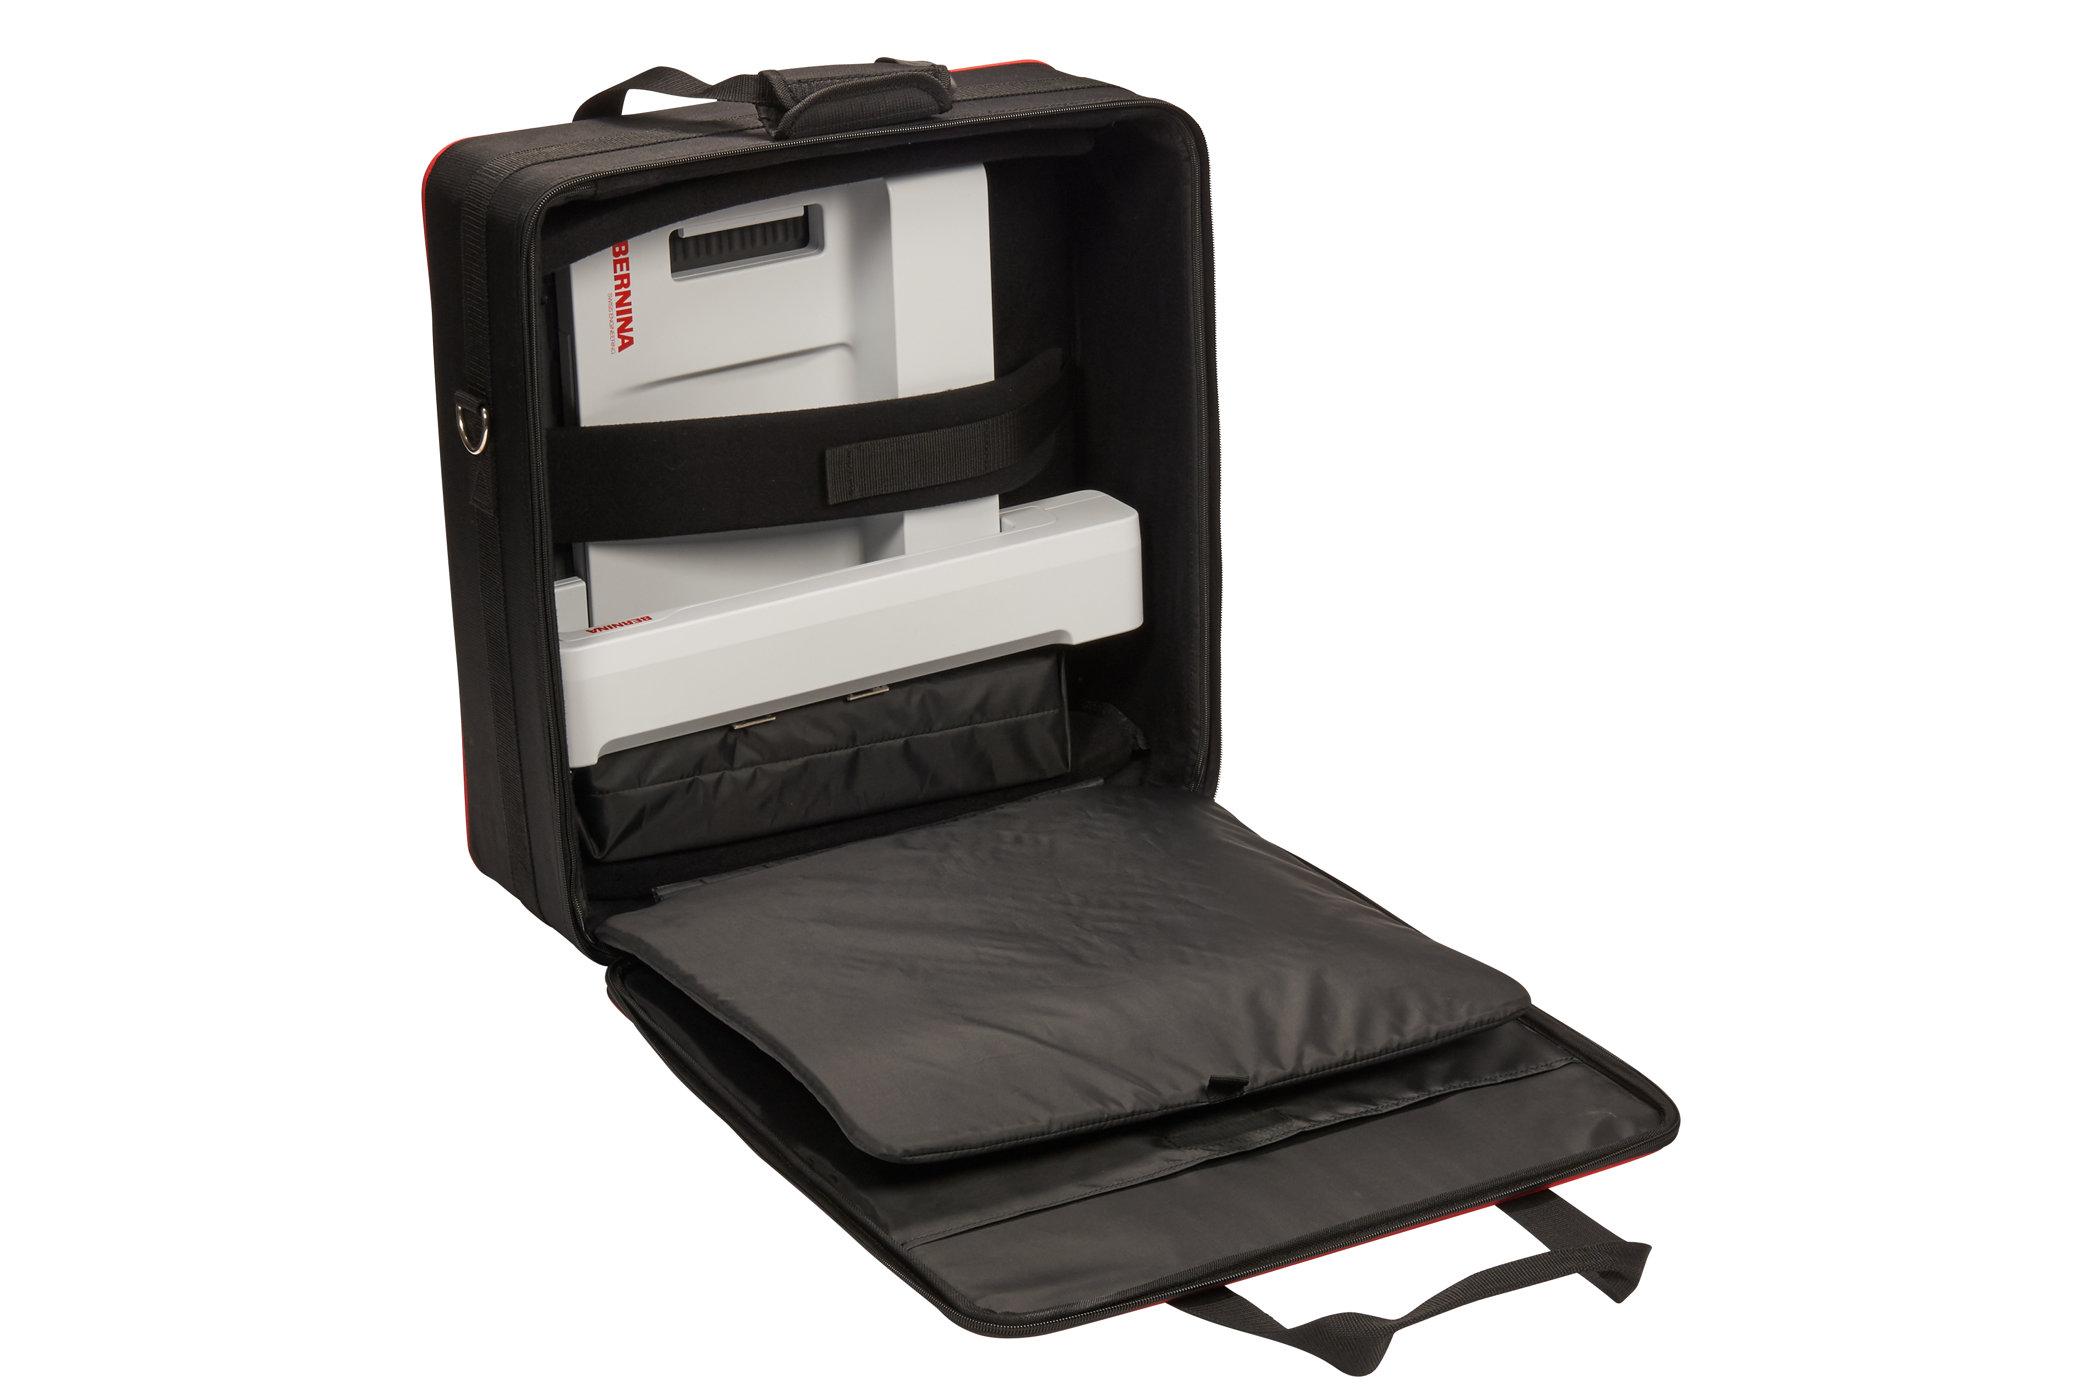 Embroidery-module bag L - Accessories - BERNINA 915b818fa7aaf